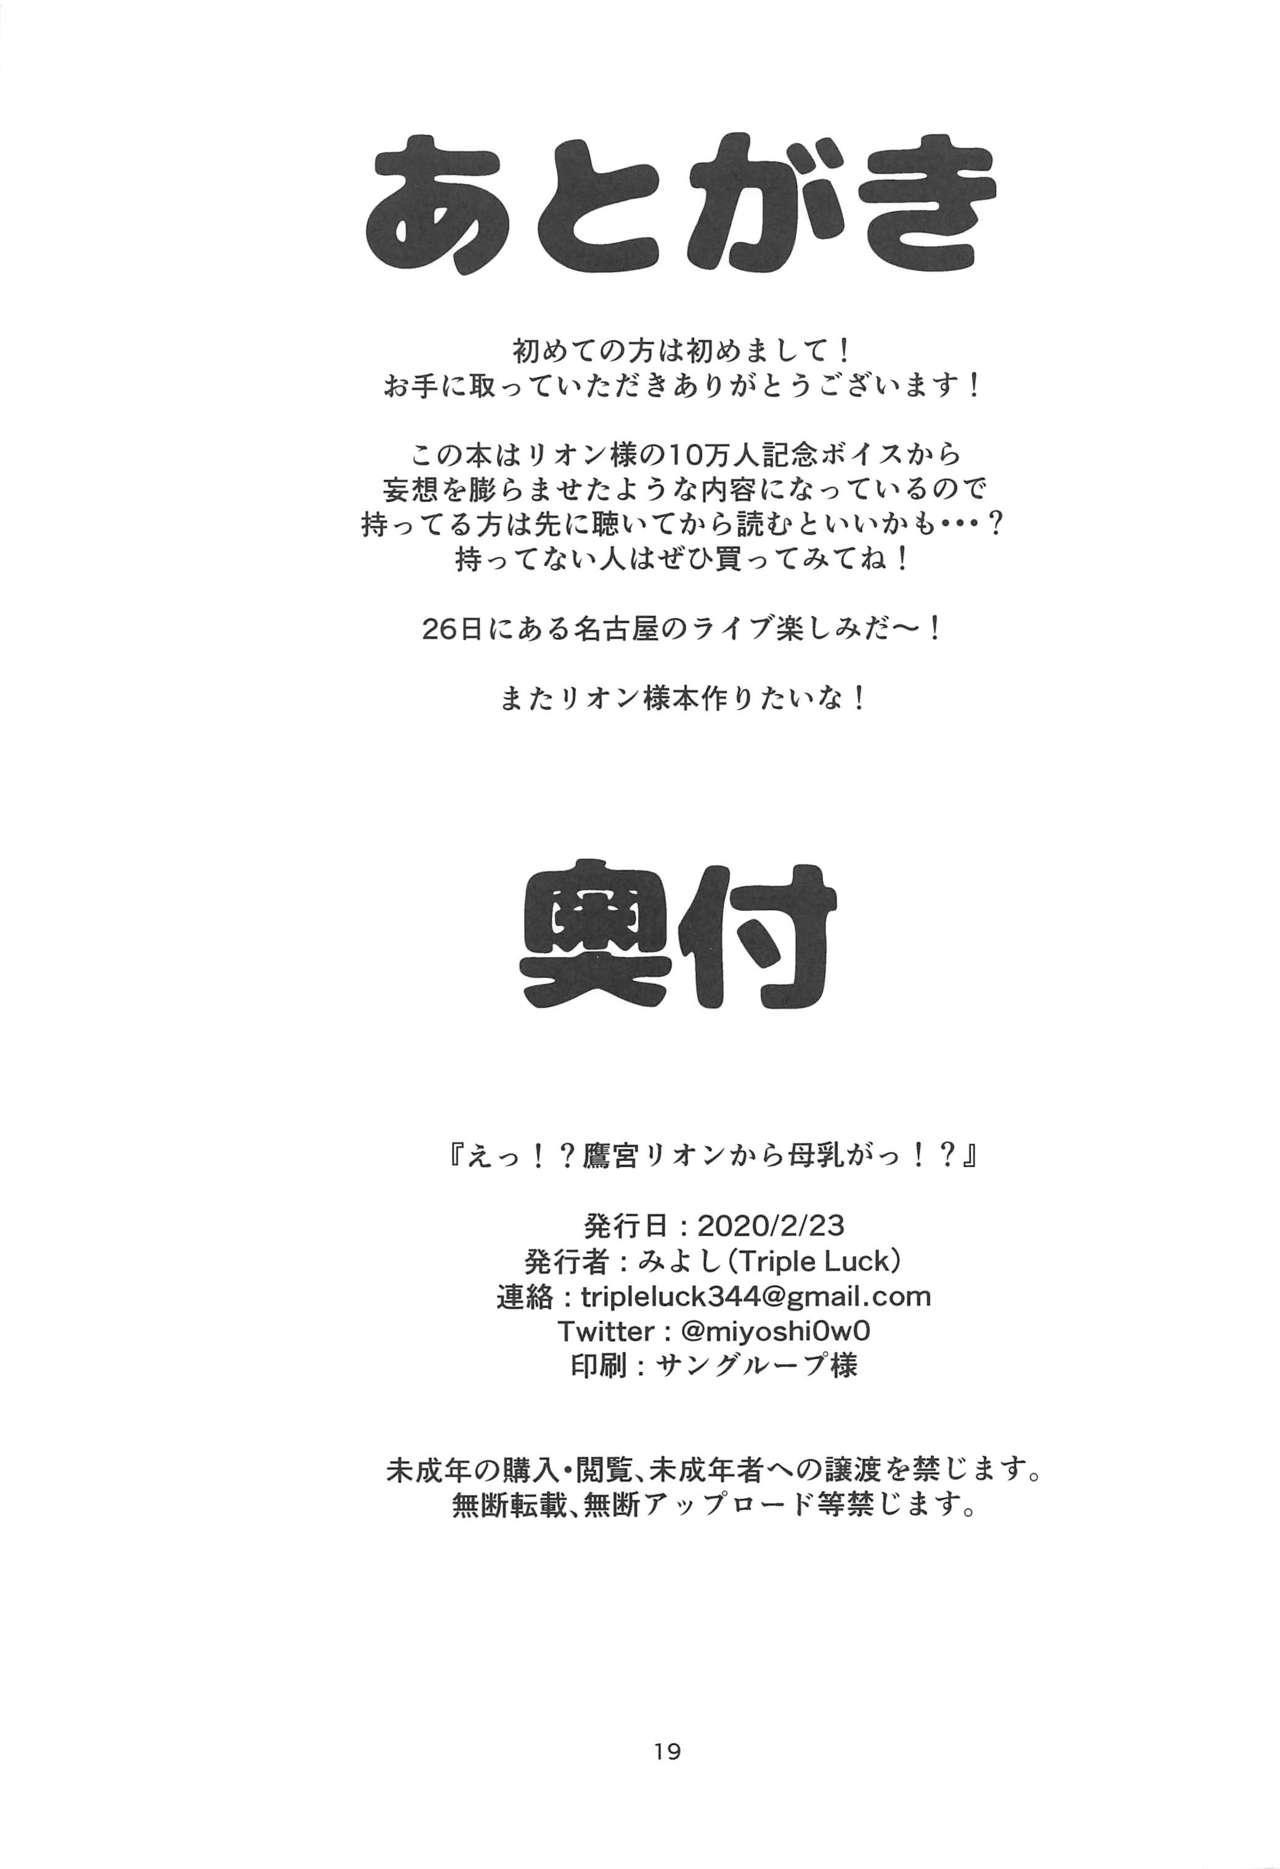 E!? Takamiya Rion kara Bonyuu ga!? 17